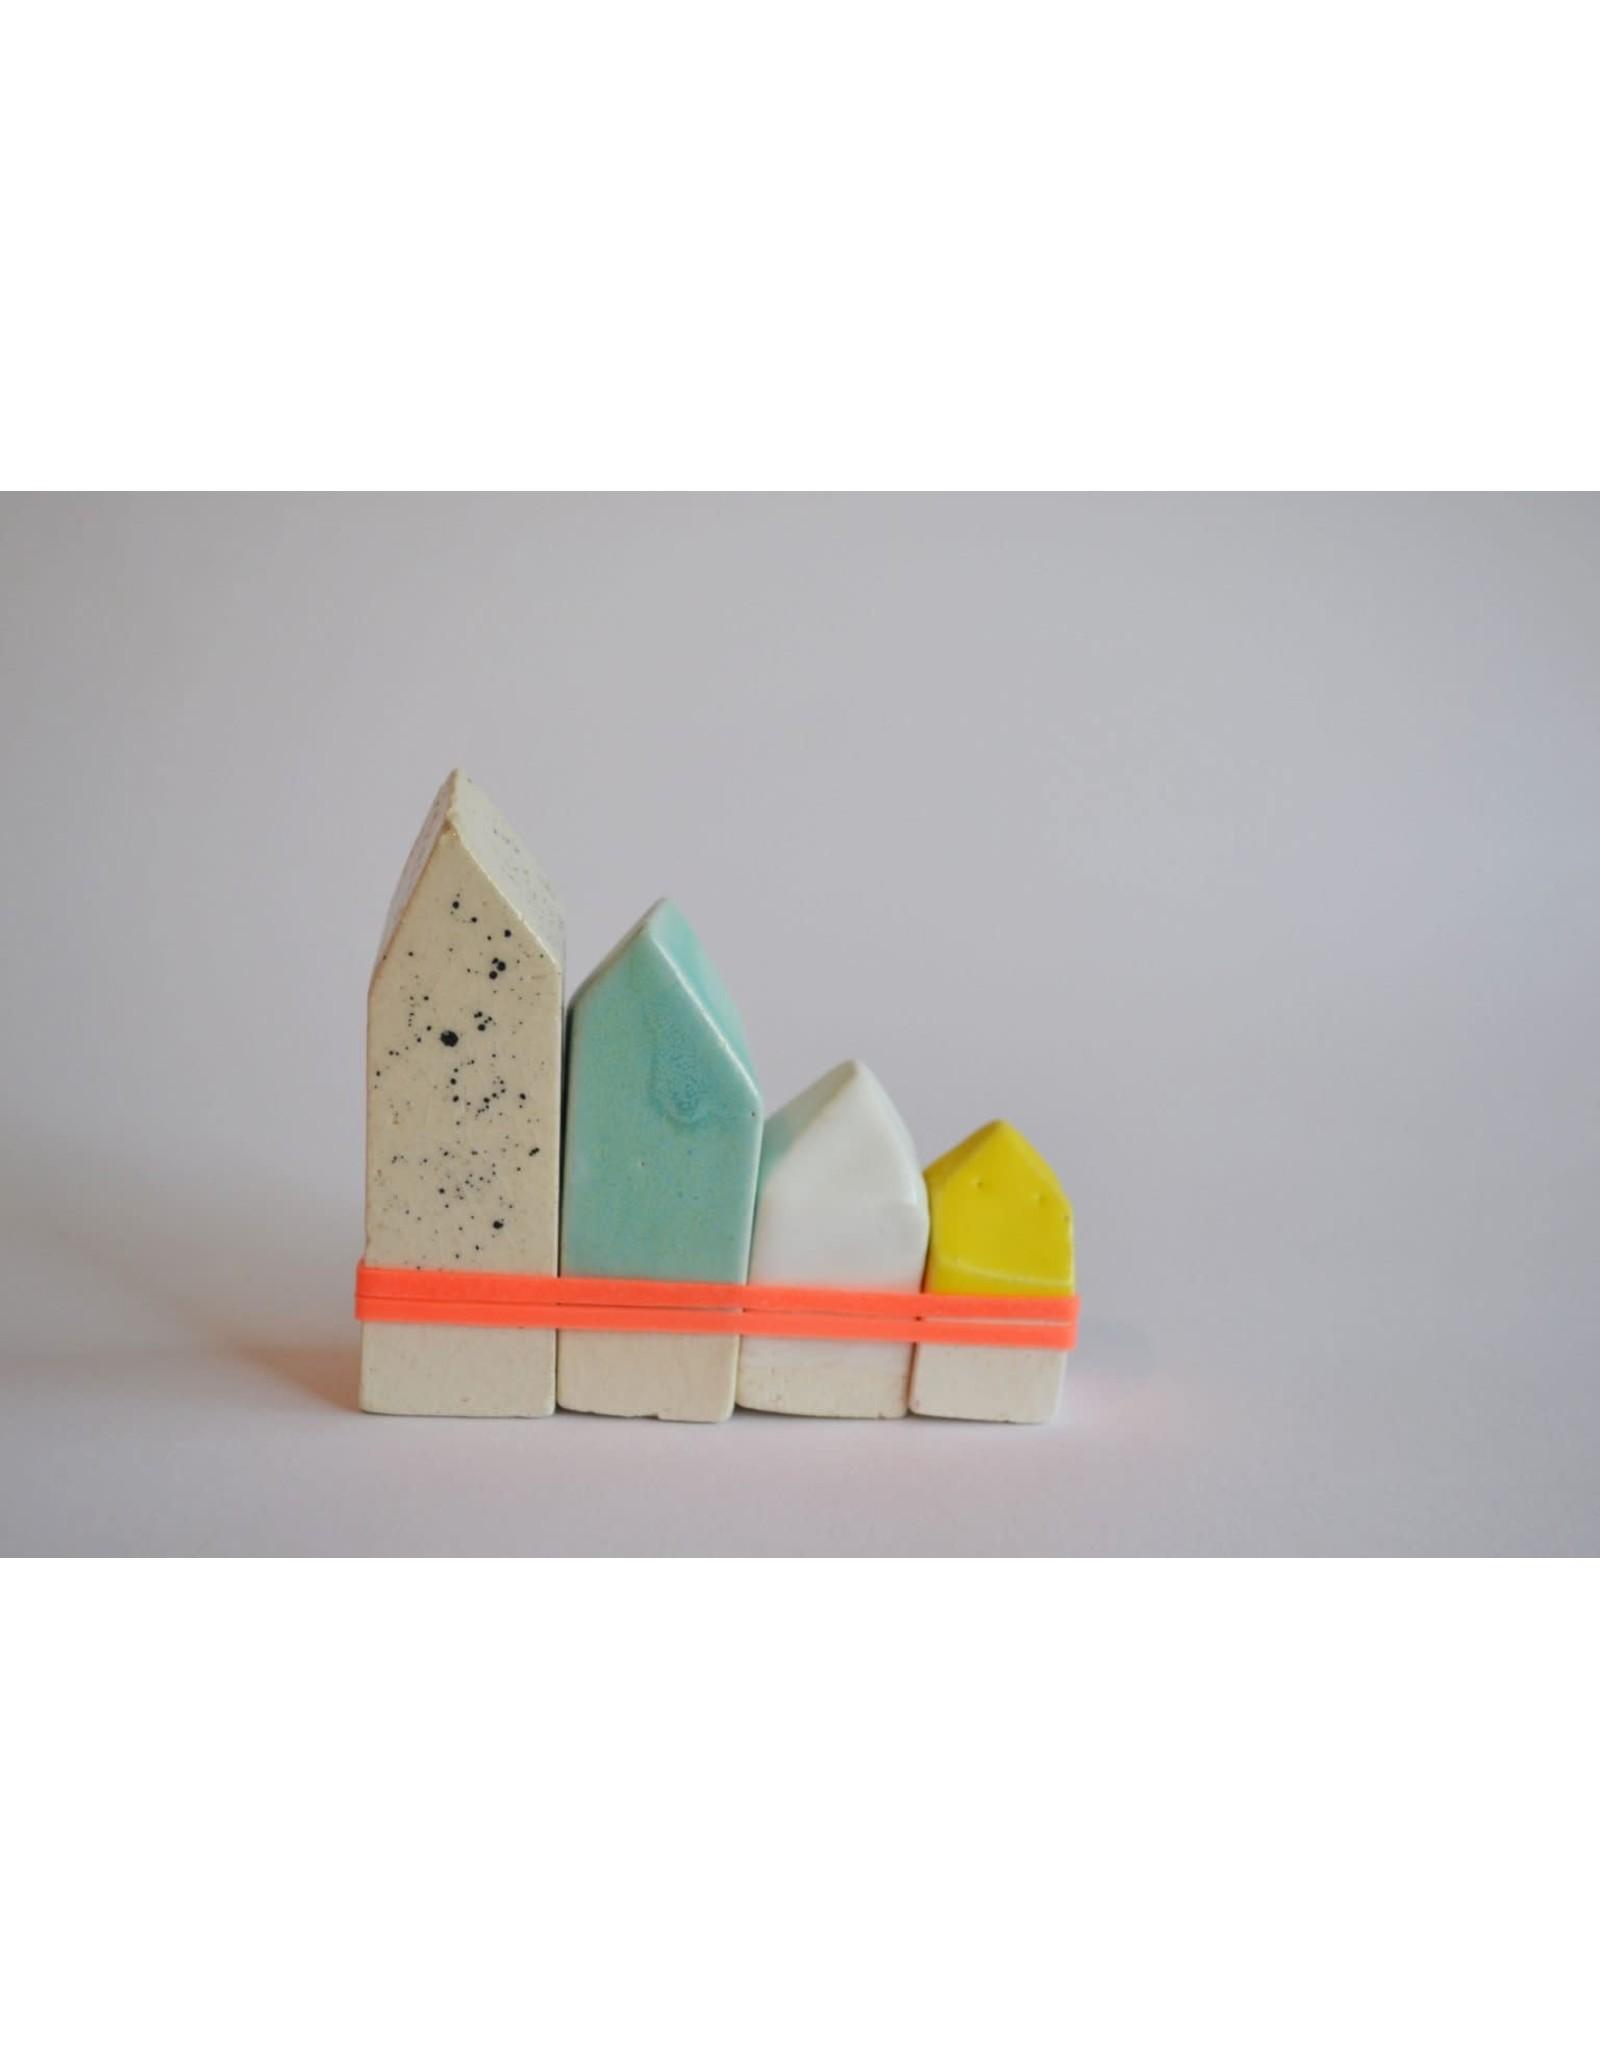 Kesemy design Amsterdamse Huisjes - Keramiek - 8 x 6 cm - Handgemaakt - Uniek